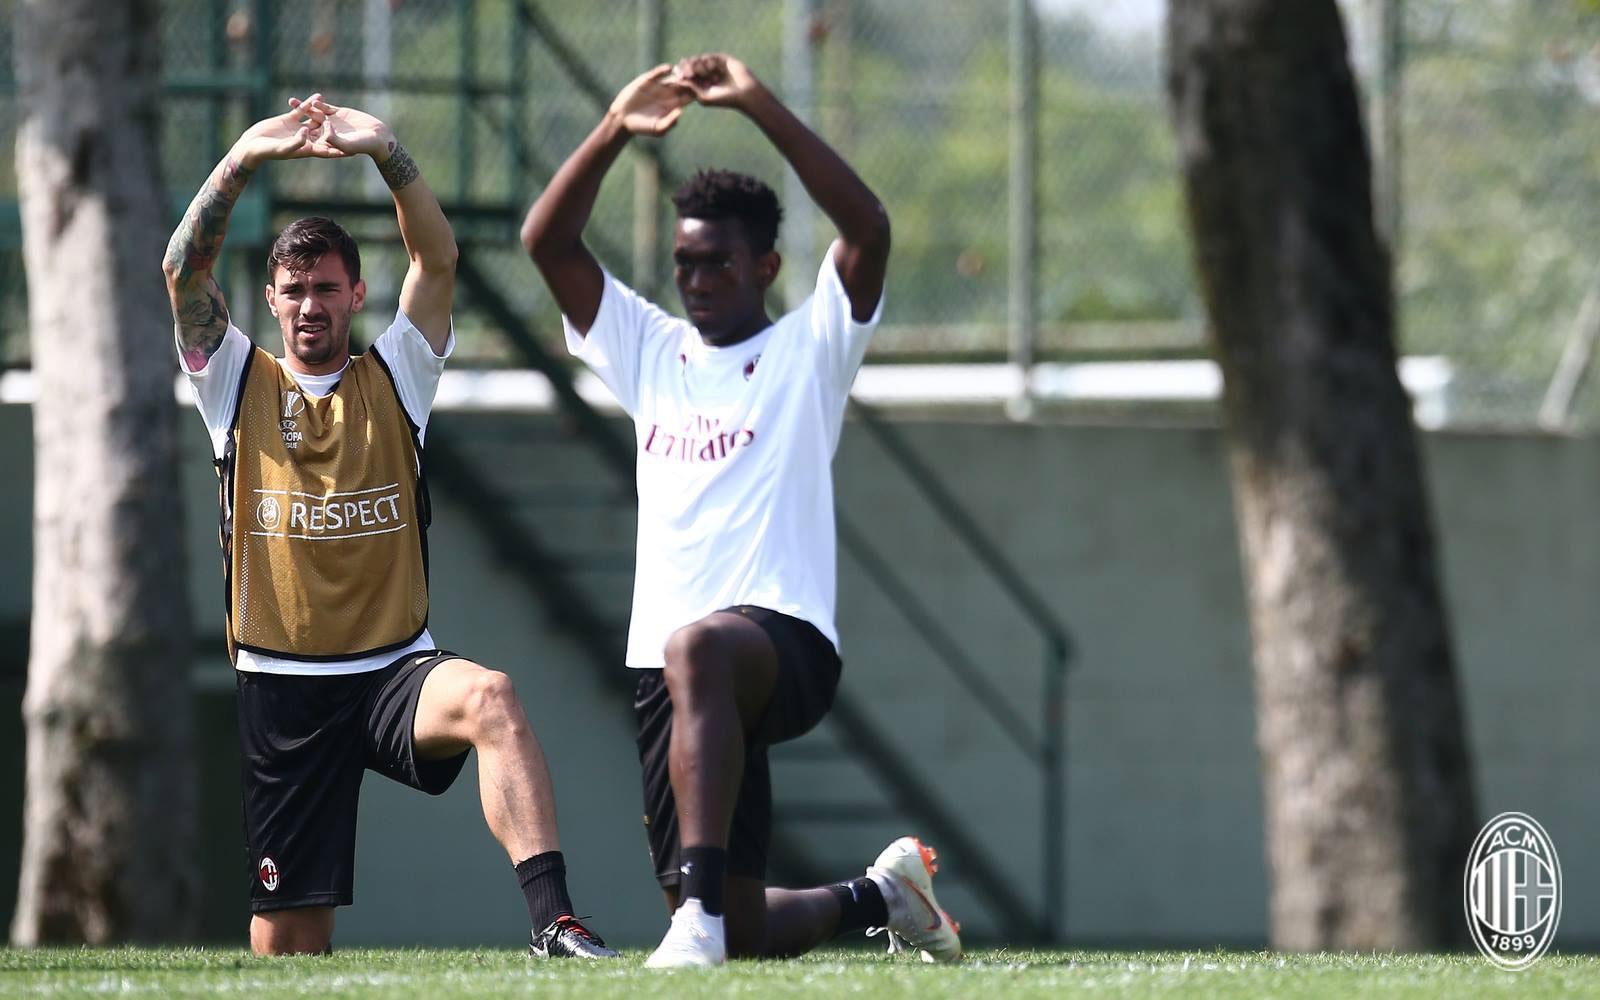 Alessio Romagnoli and Frank Tsadjout during training at Milanello. (@acmilan.com)